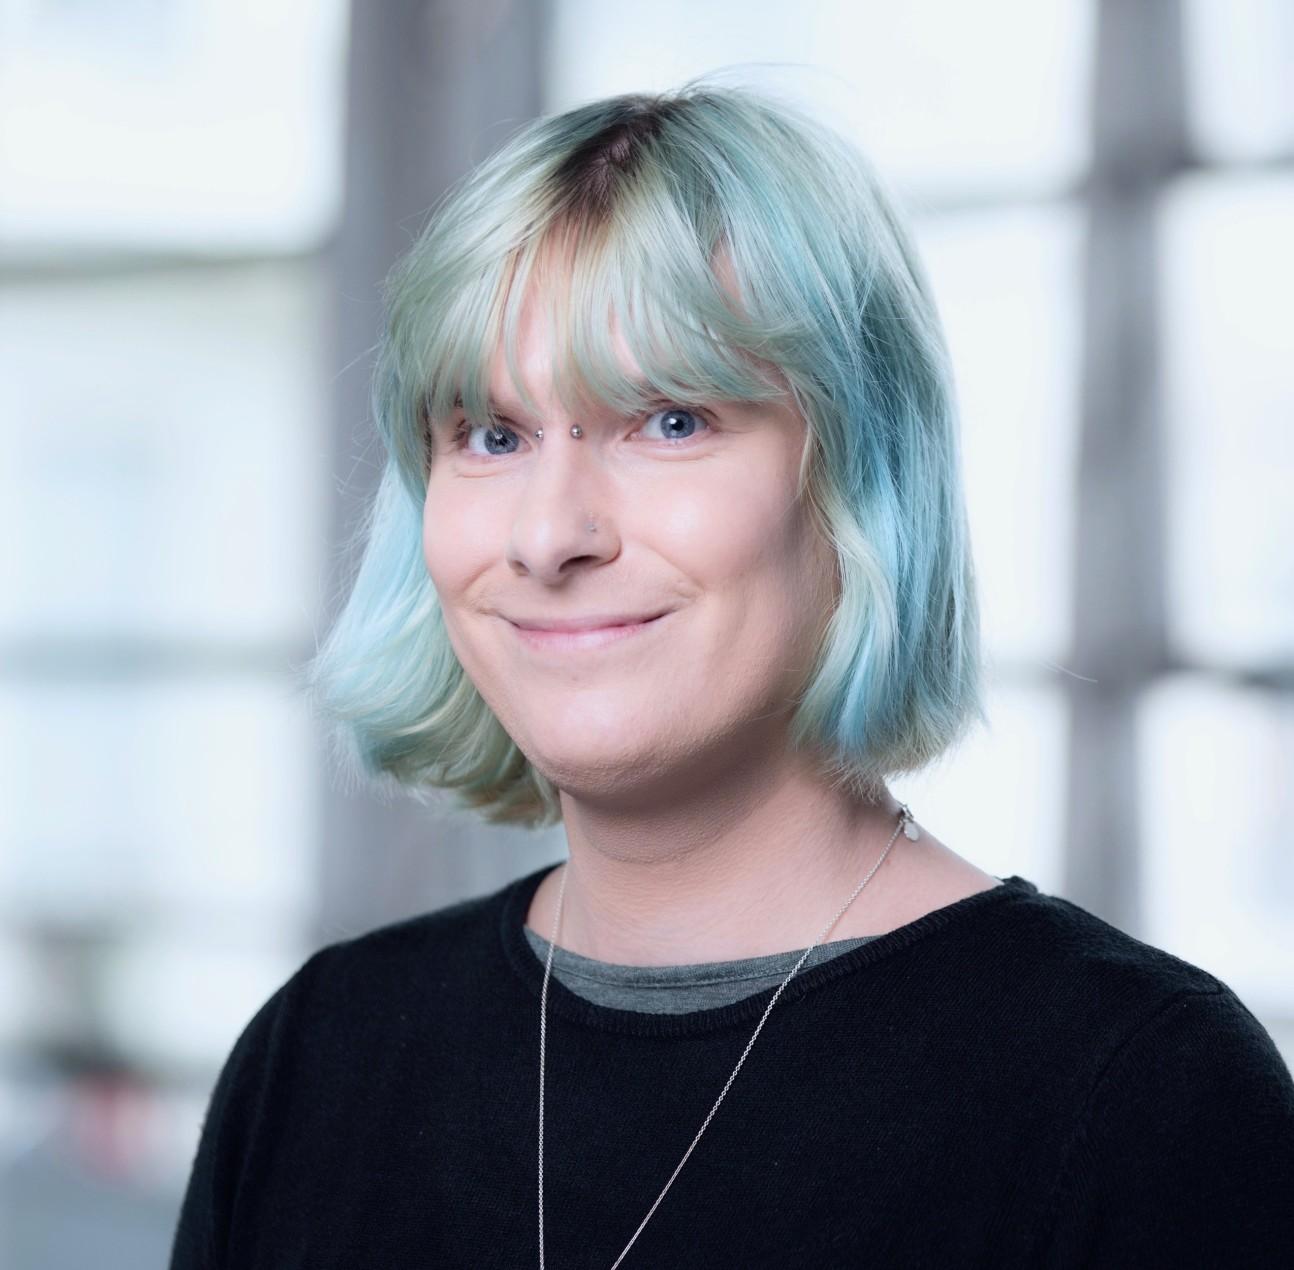 Julia Stawarz  - stawarzje headshot2 1610100957202 x2 - Space plasma and exoplanet experts receive Royal Astronomical Society awards | Imperial News